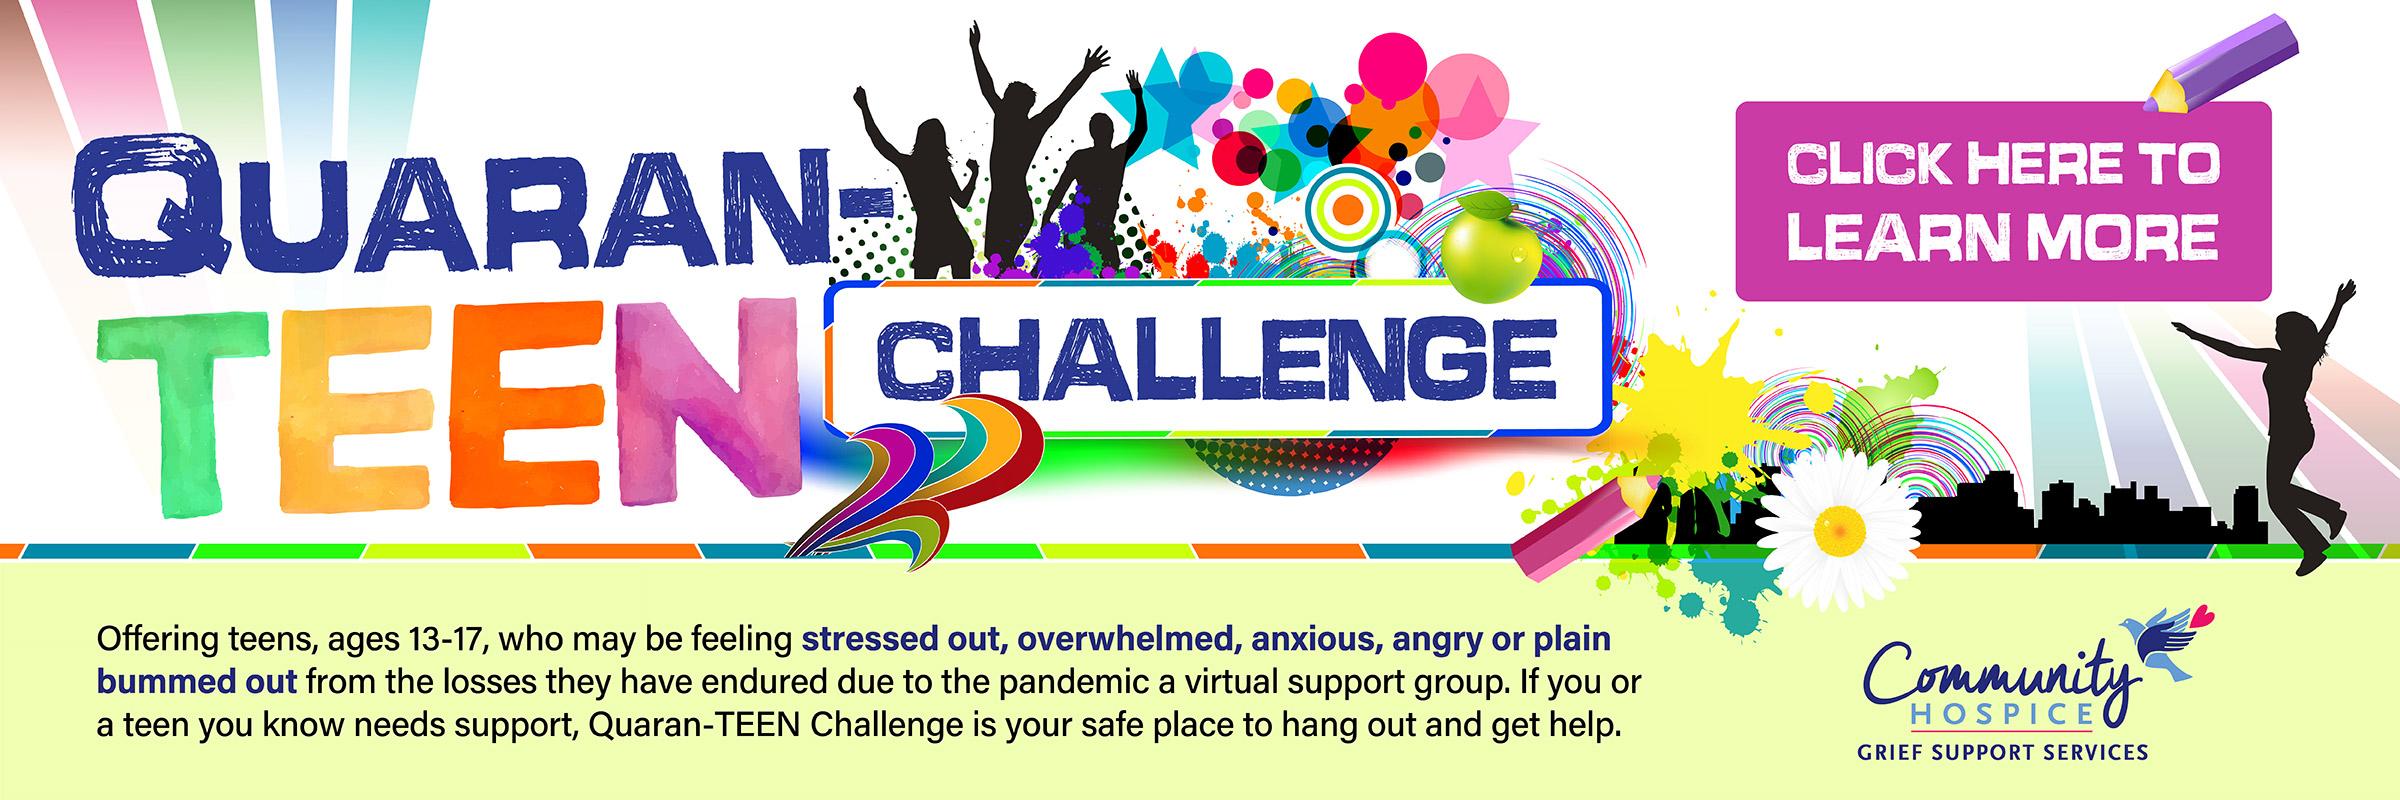 QuaranTEEN-Challenge_Web-Banner